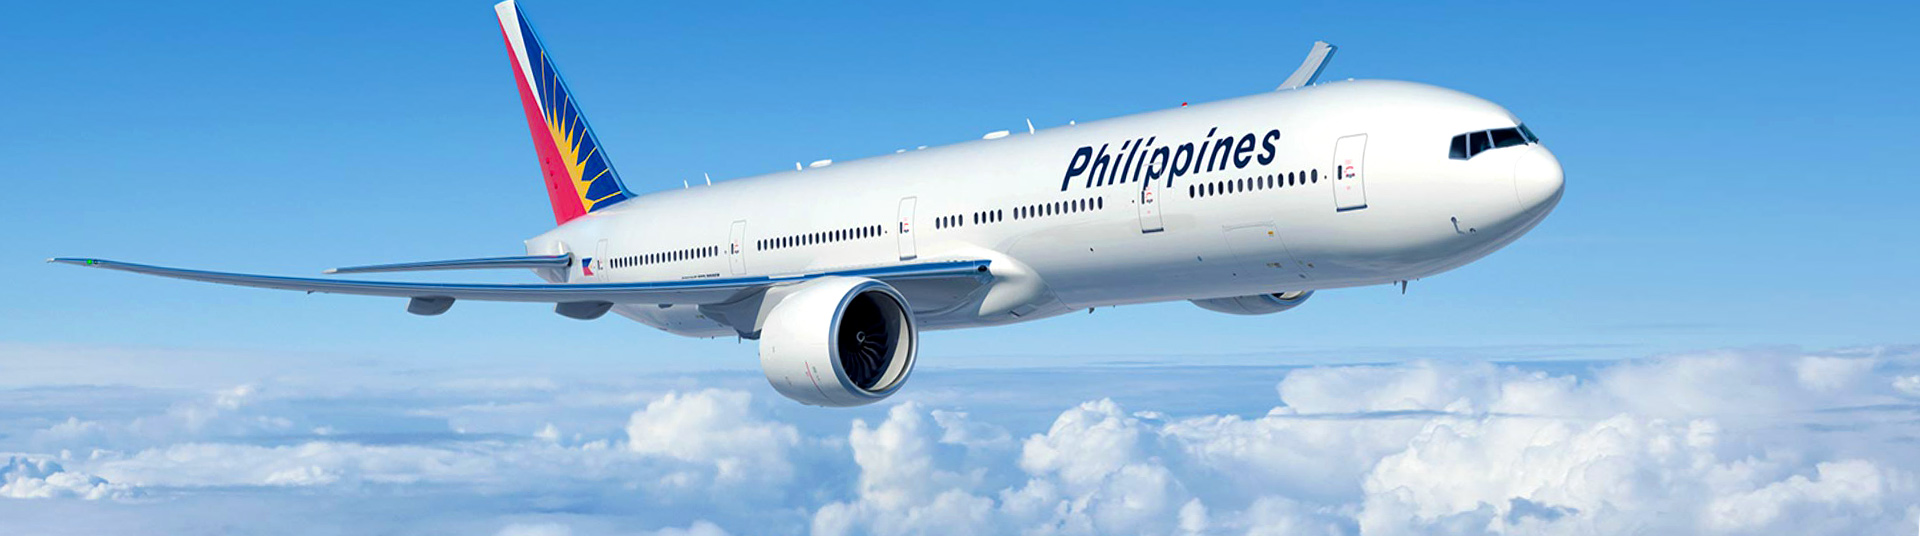 Philippine airlines pr r servez un vol philippine for Air madagascar vol interieur horaire